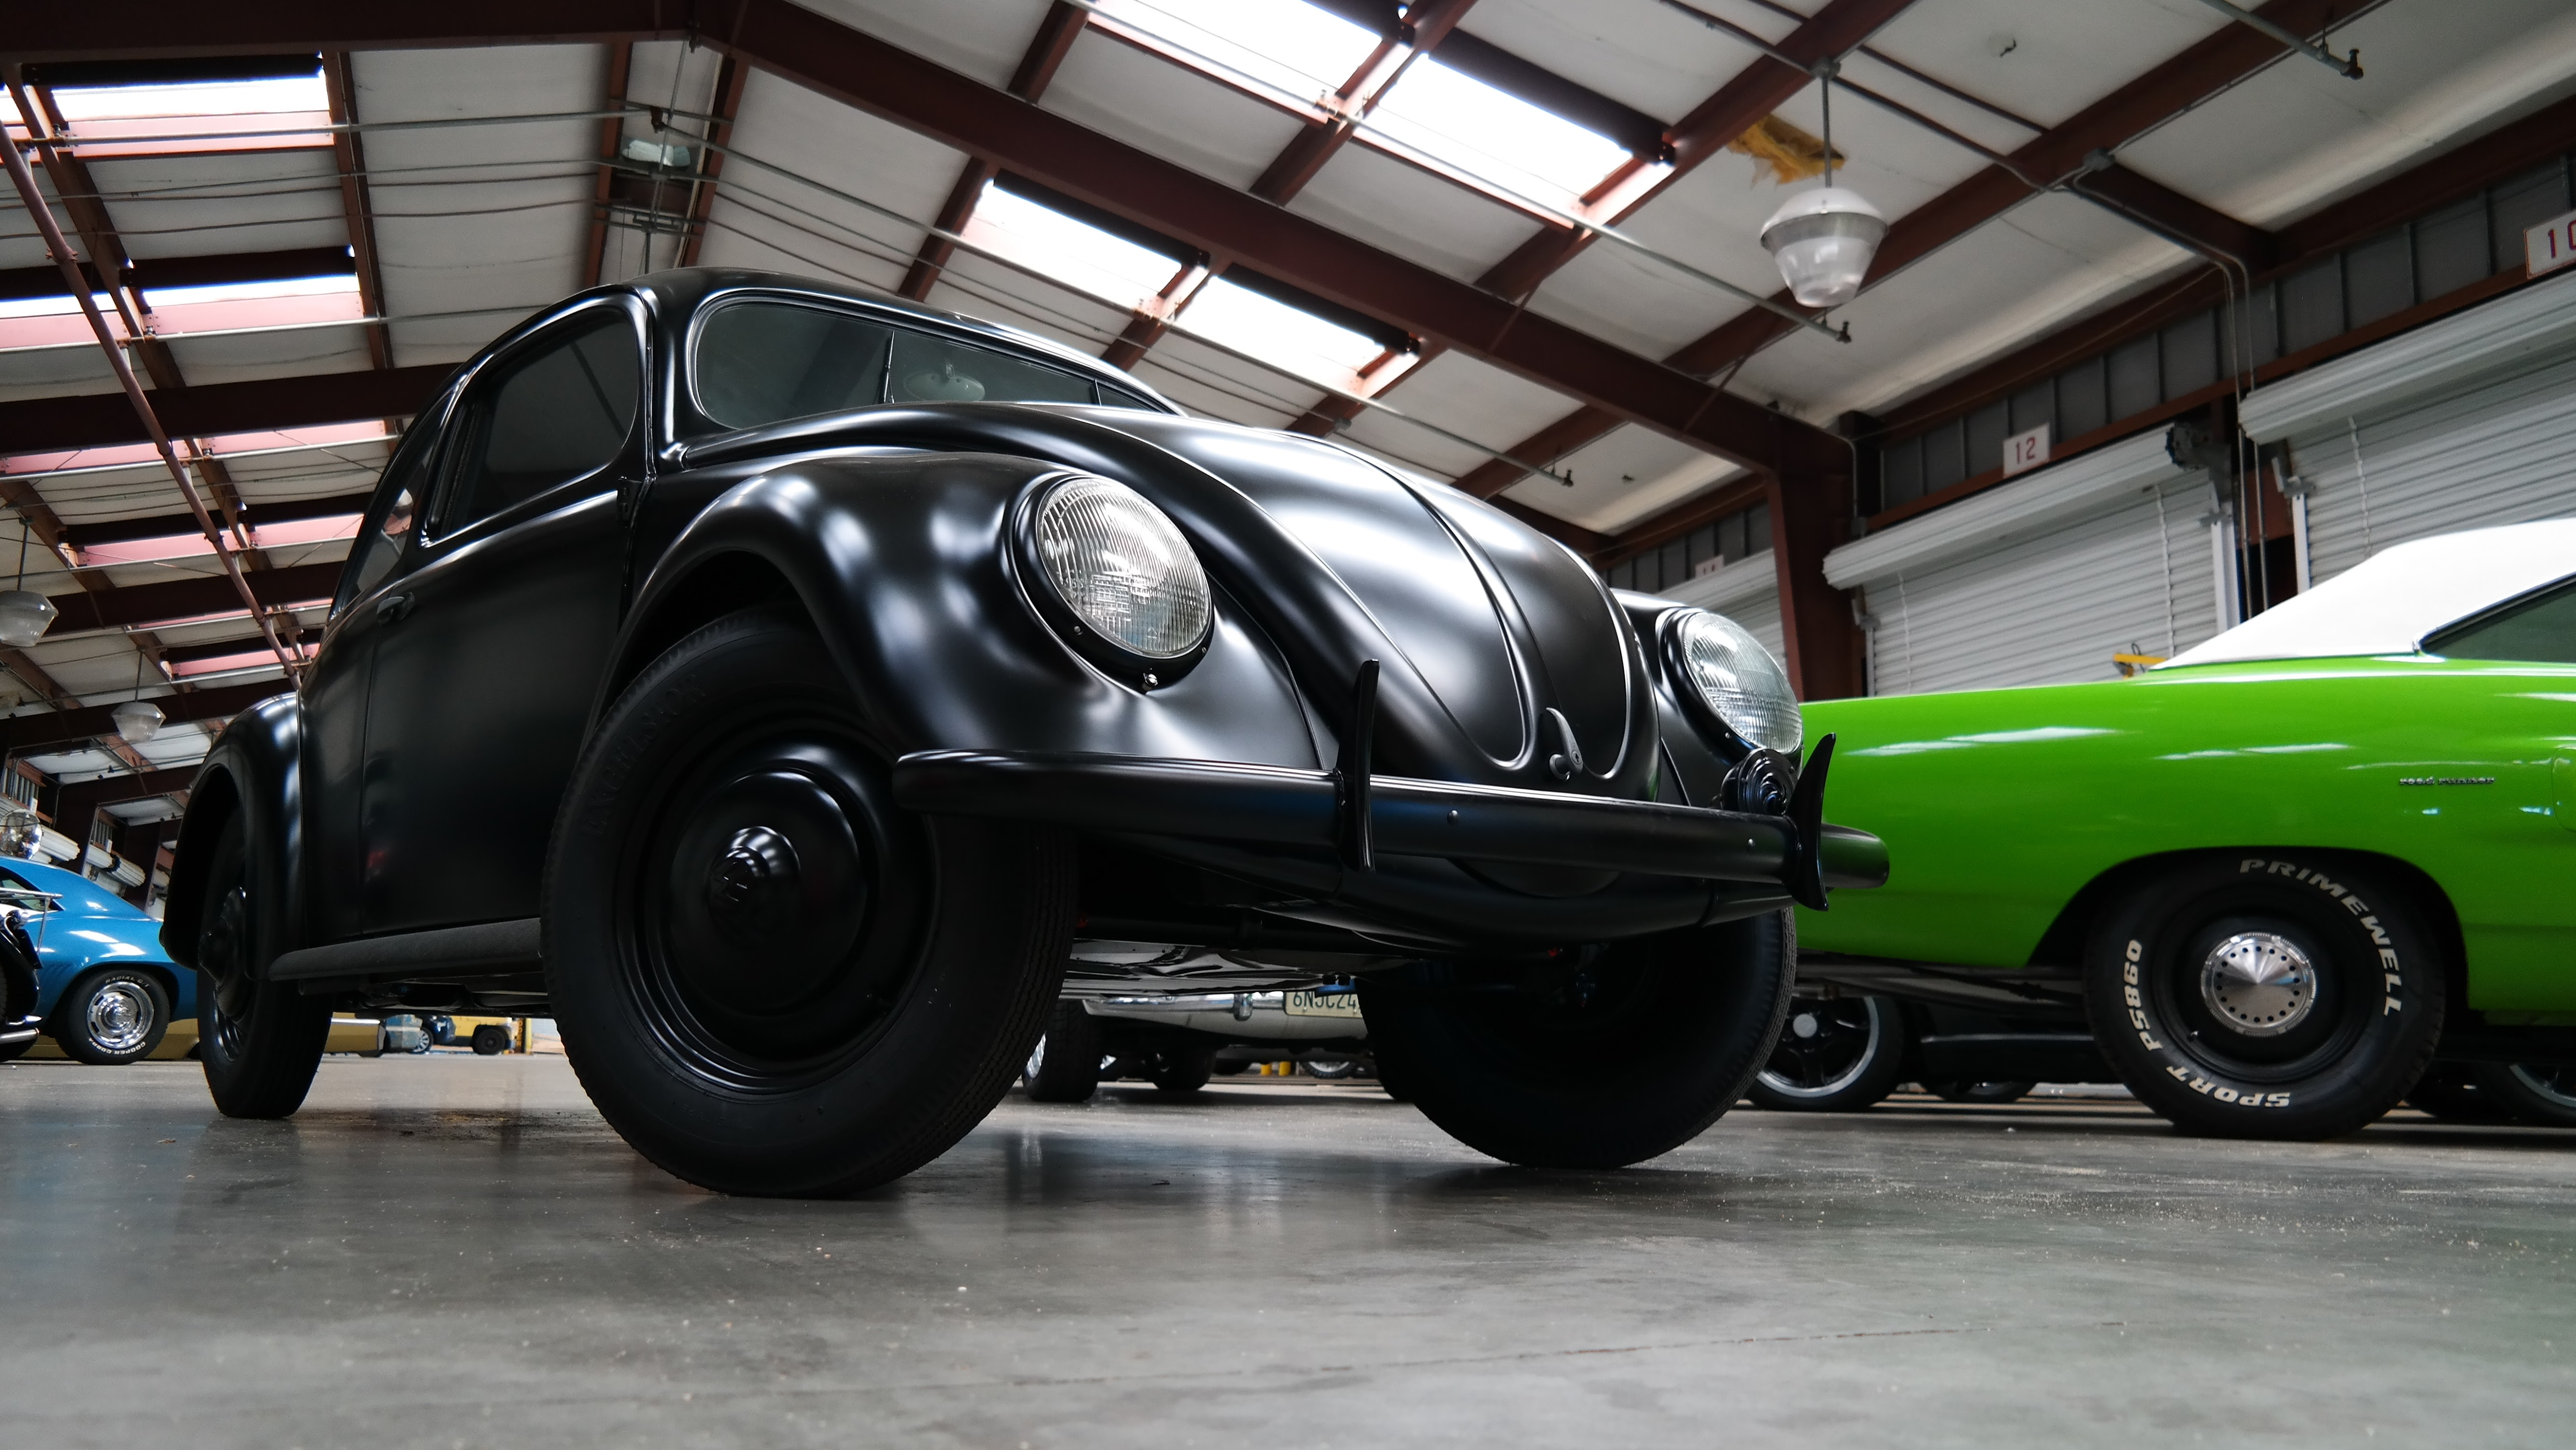 Custom VW Beetle Shipped to Europe